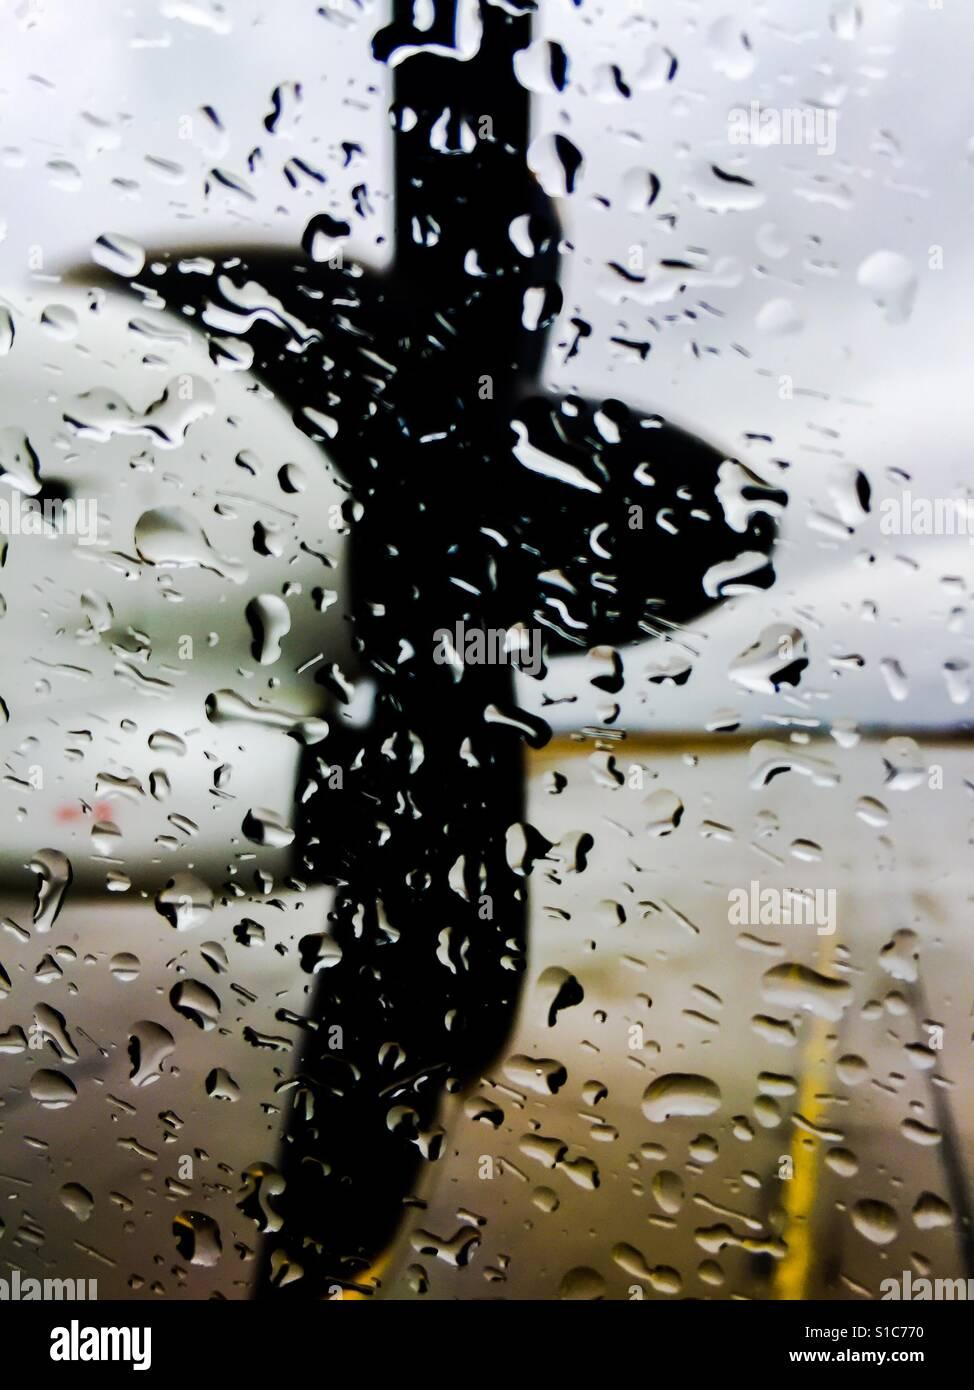 Raindrops on Turboprop window - Stock Image